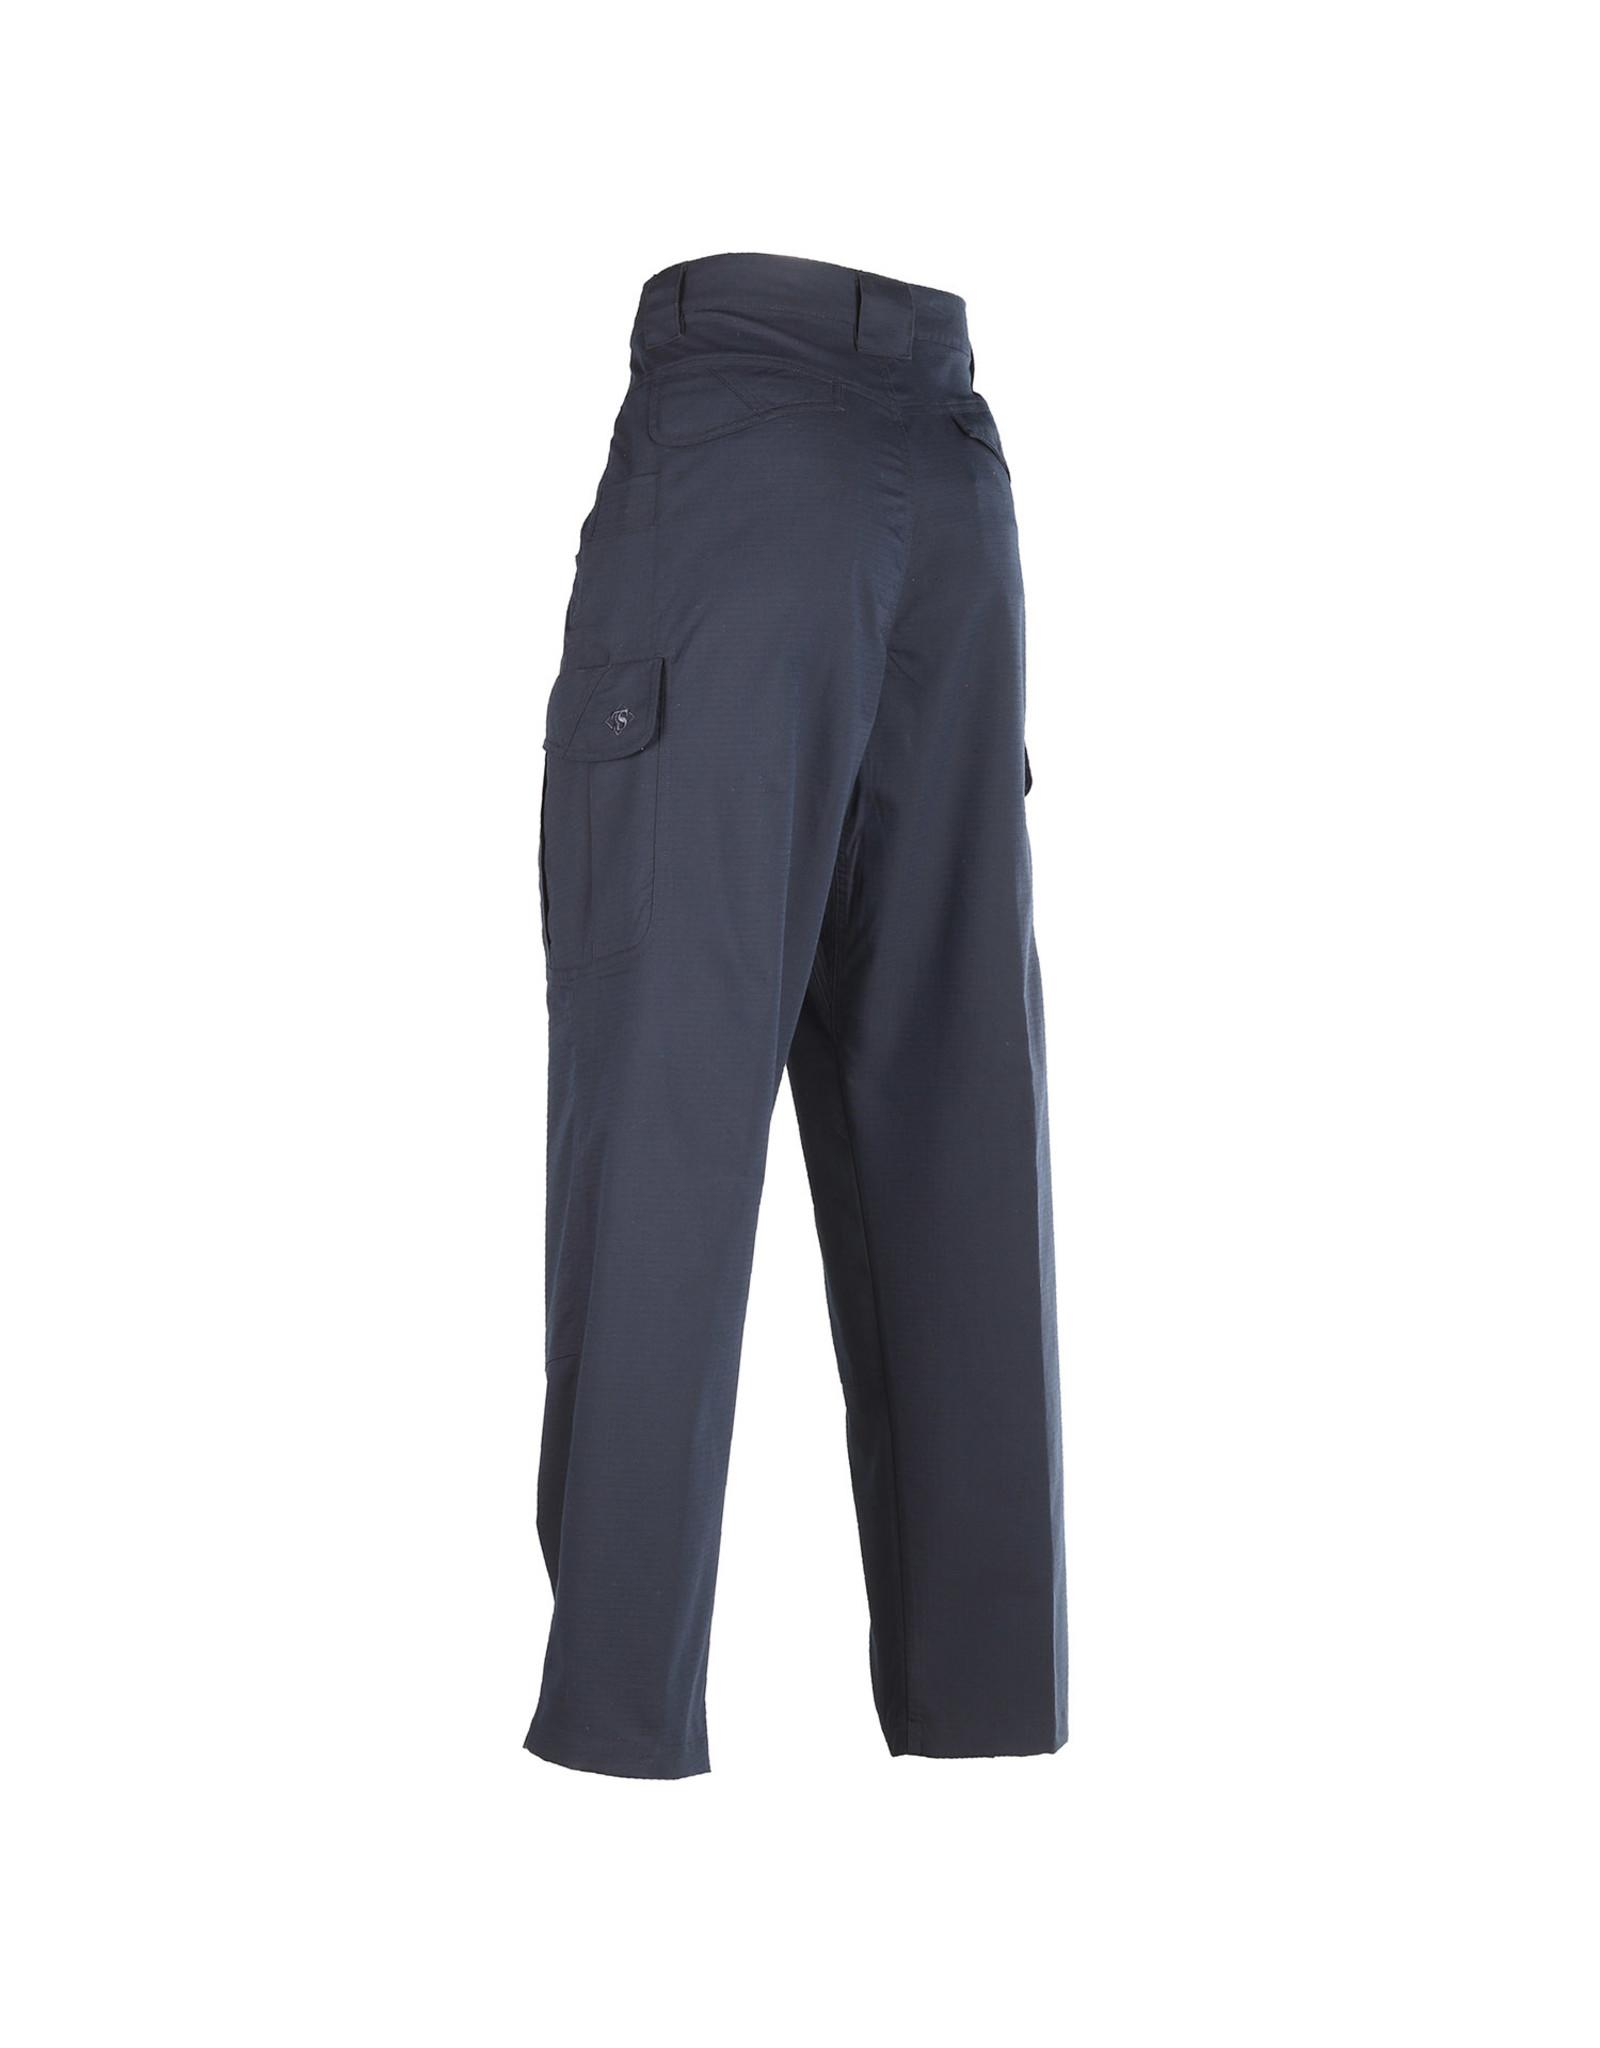 TRU-SPEC Men's 24/7 Ascent pant (unhemmed)